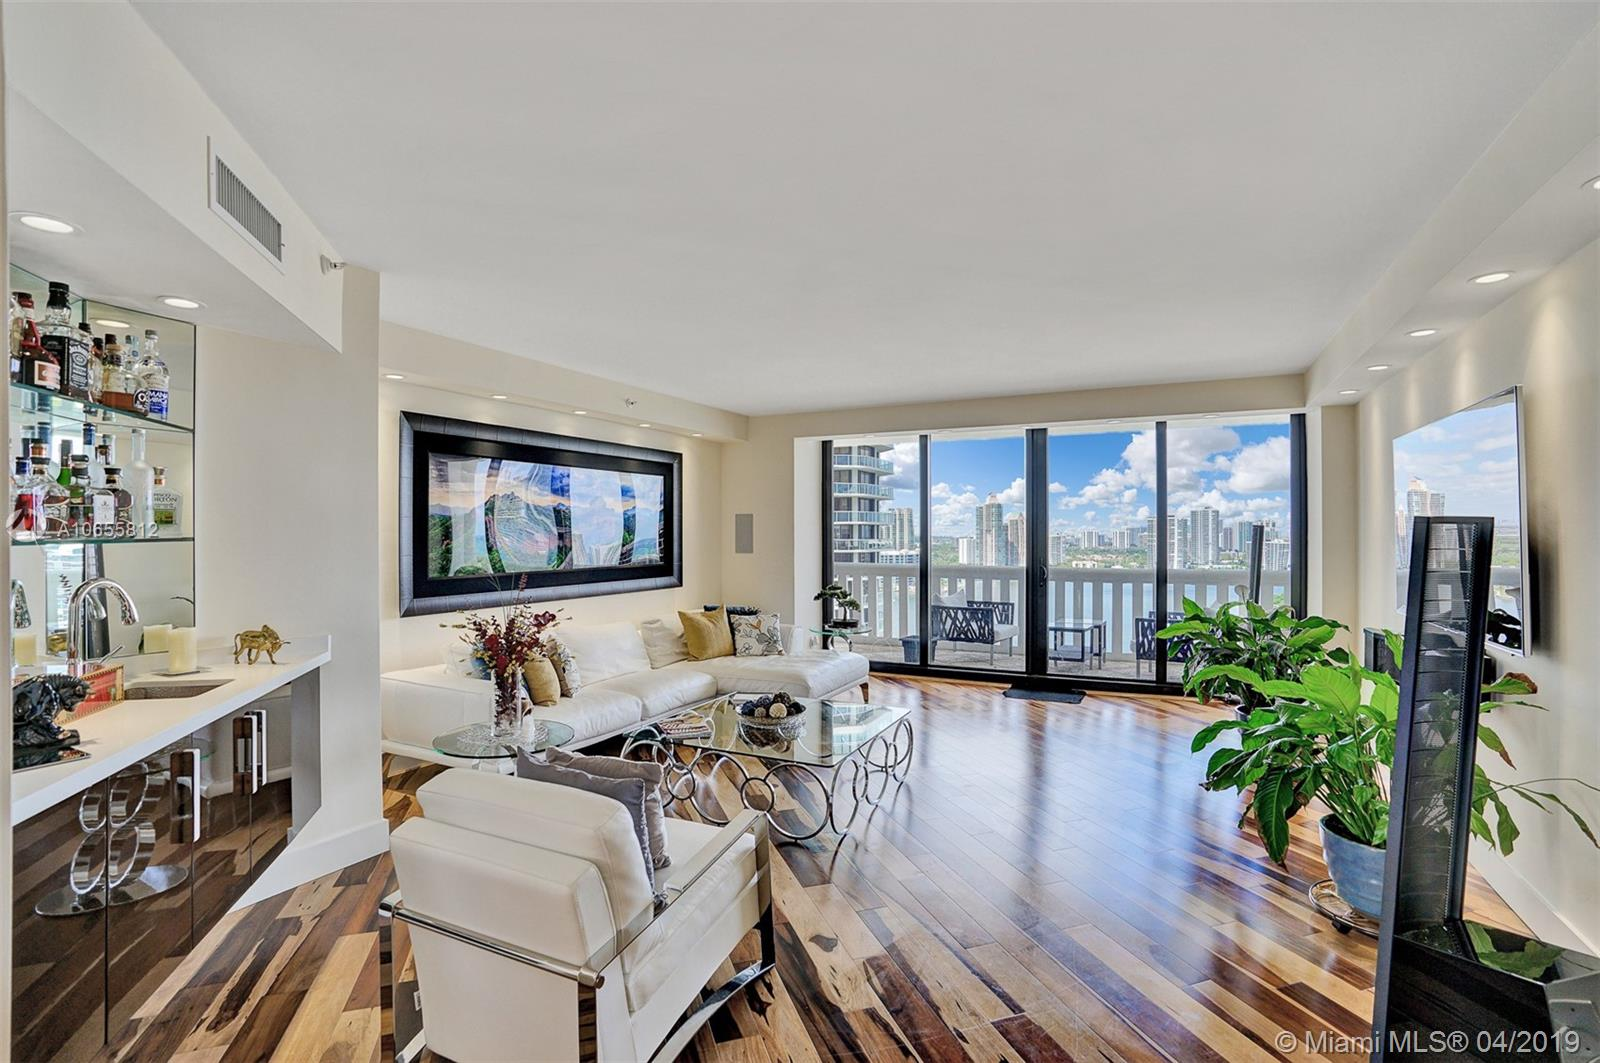 3000 Island Blvd #2403, Aventura, FL 33160 - Aventura, FL real estate listing